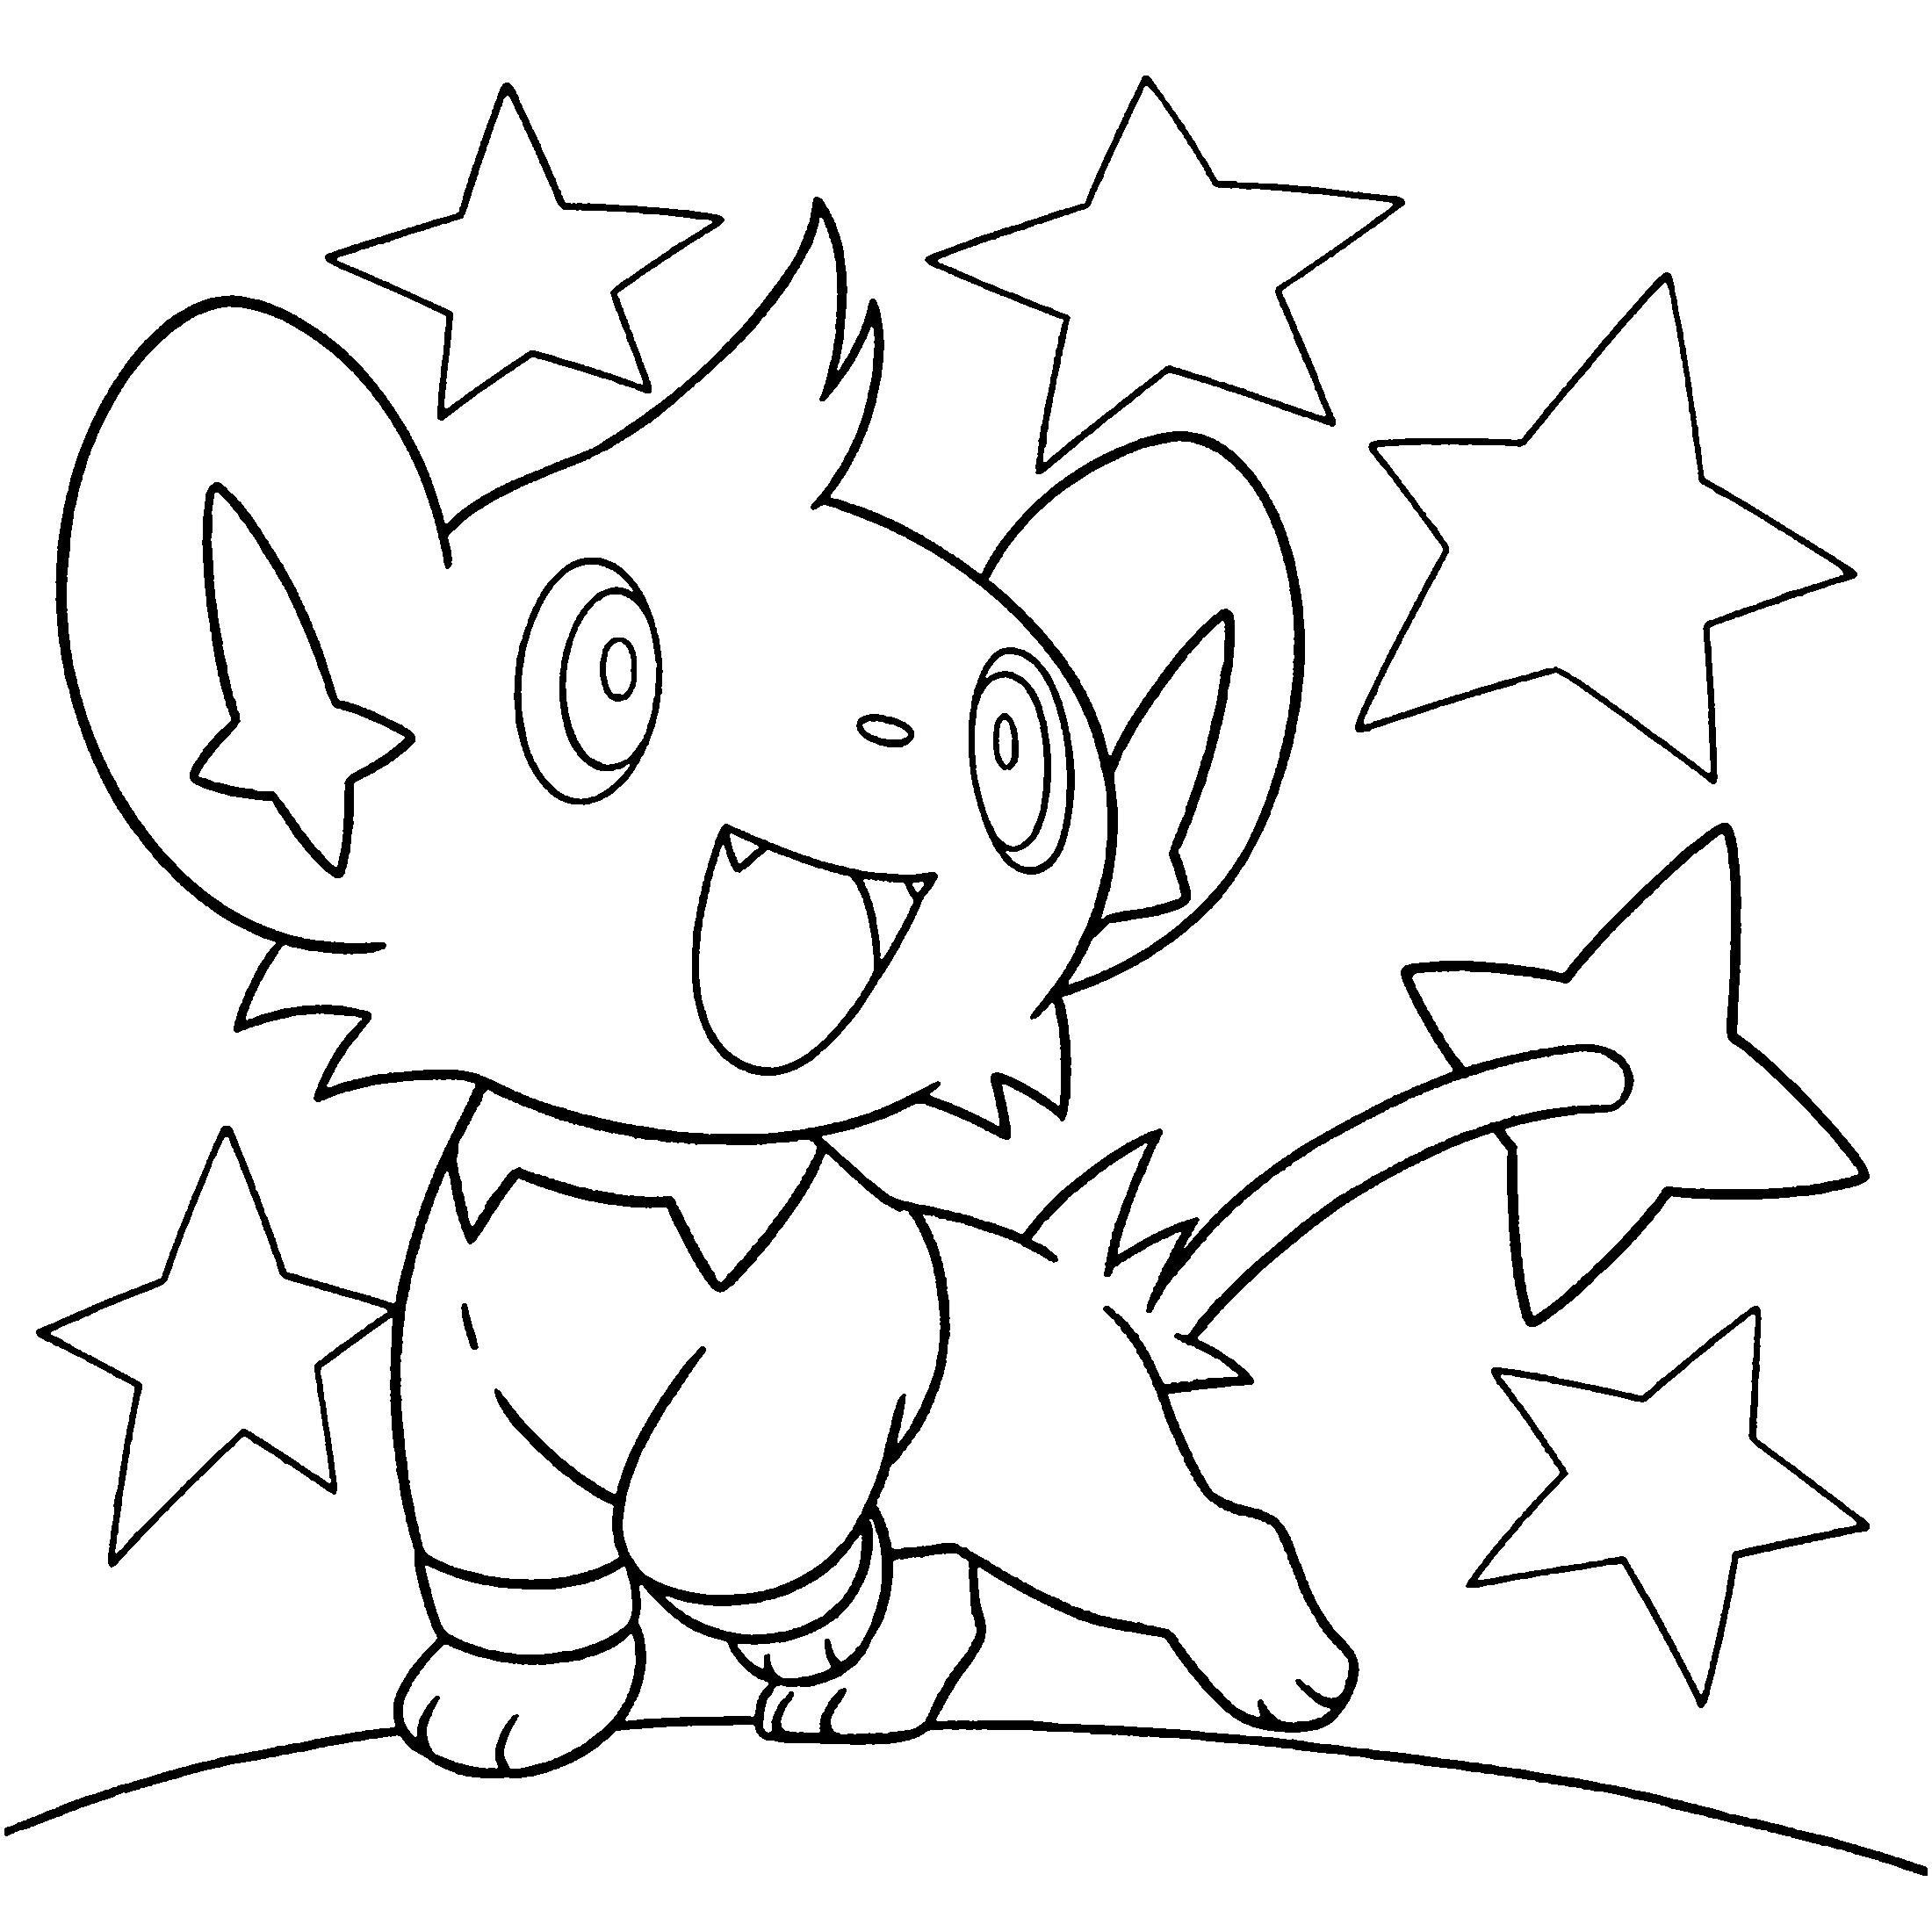 pokemon coloring pages shinx nicknames | Pokemon diamond pearl coloring pages | Pokemon coloring ...